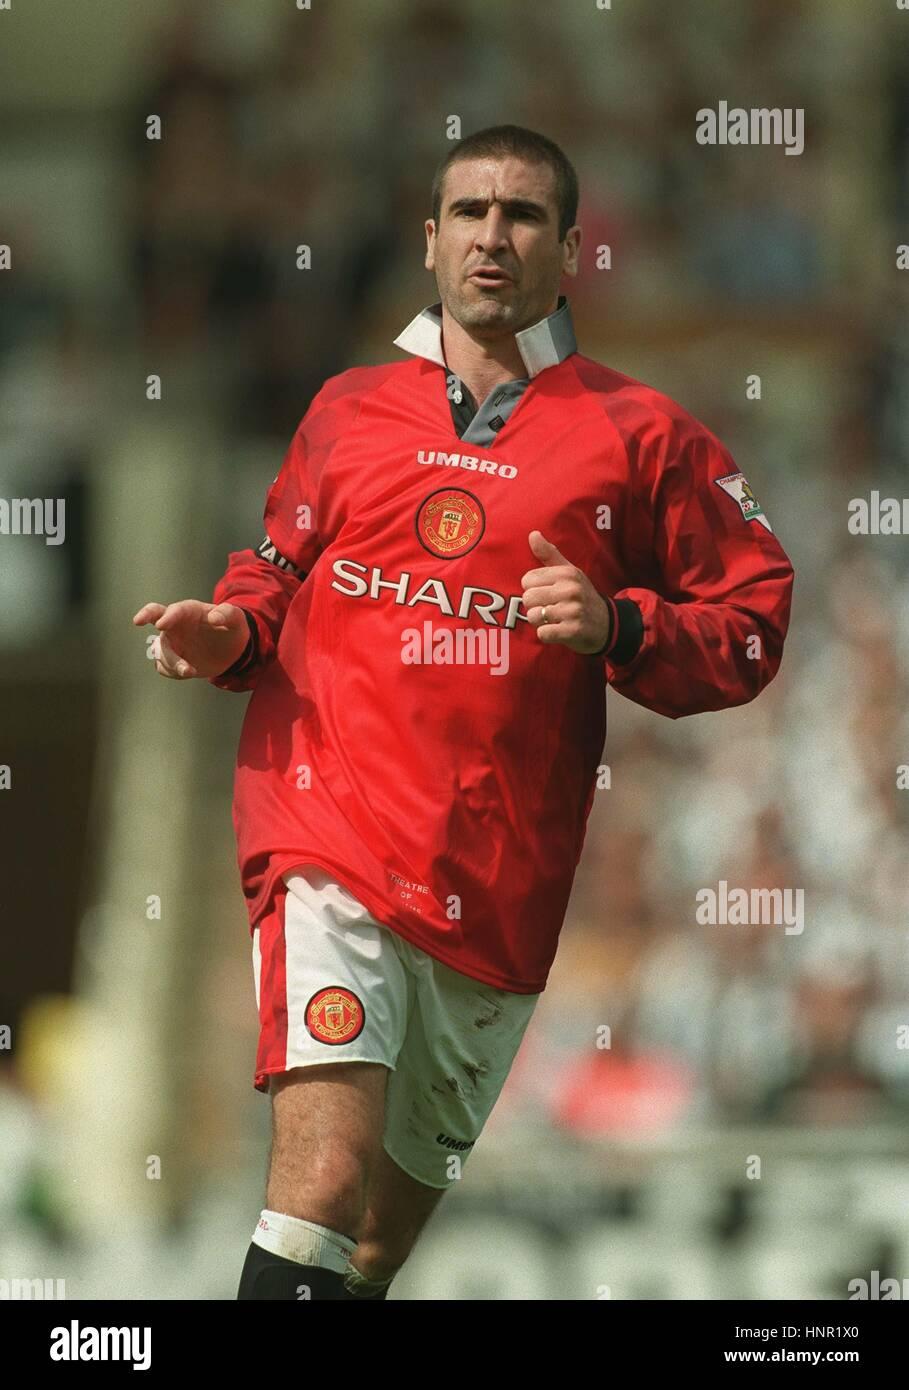 Manchester united 1996/1997/1998 home football shirt jersey #7 cantona. ERIC CANTONA MANCHESTER UNITED FC 12 August 1996 Stock ...